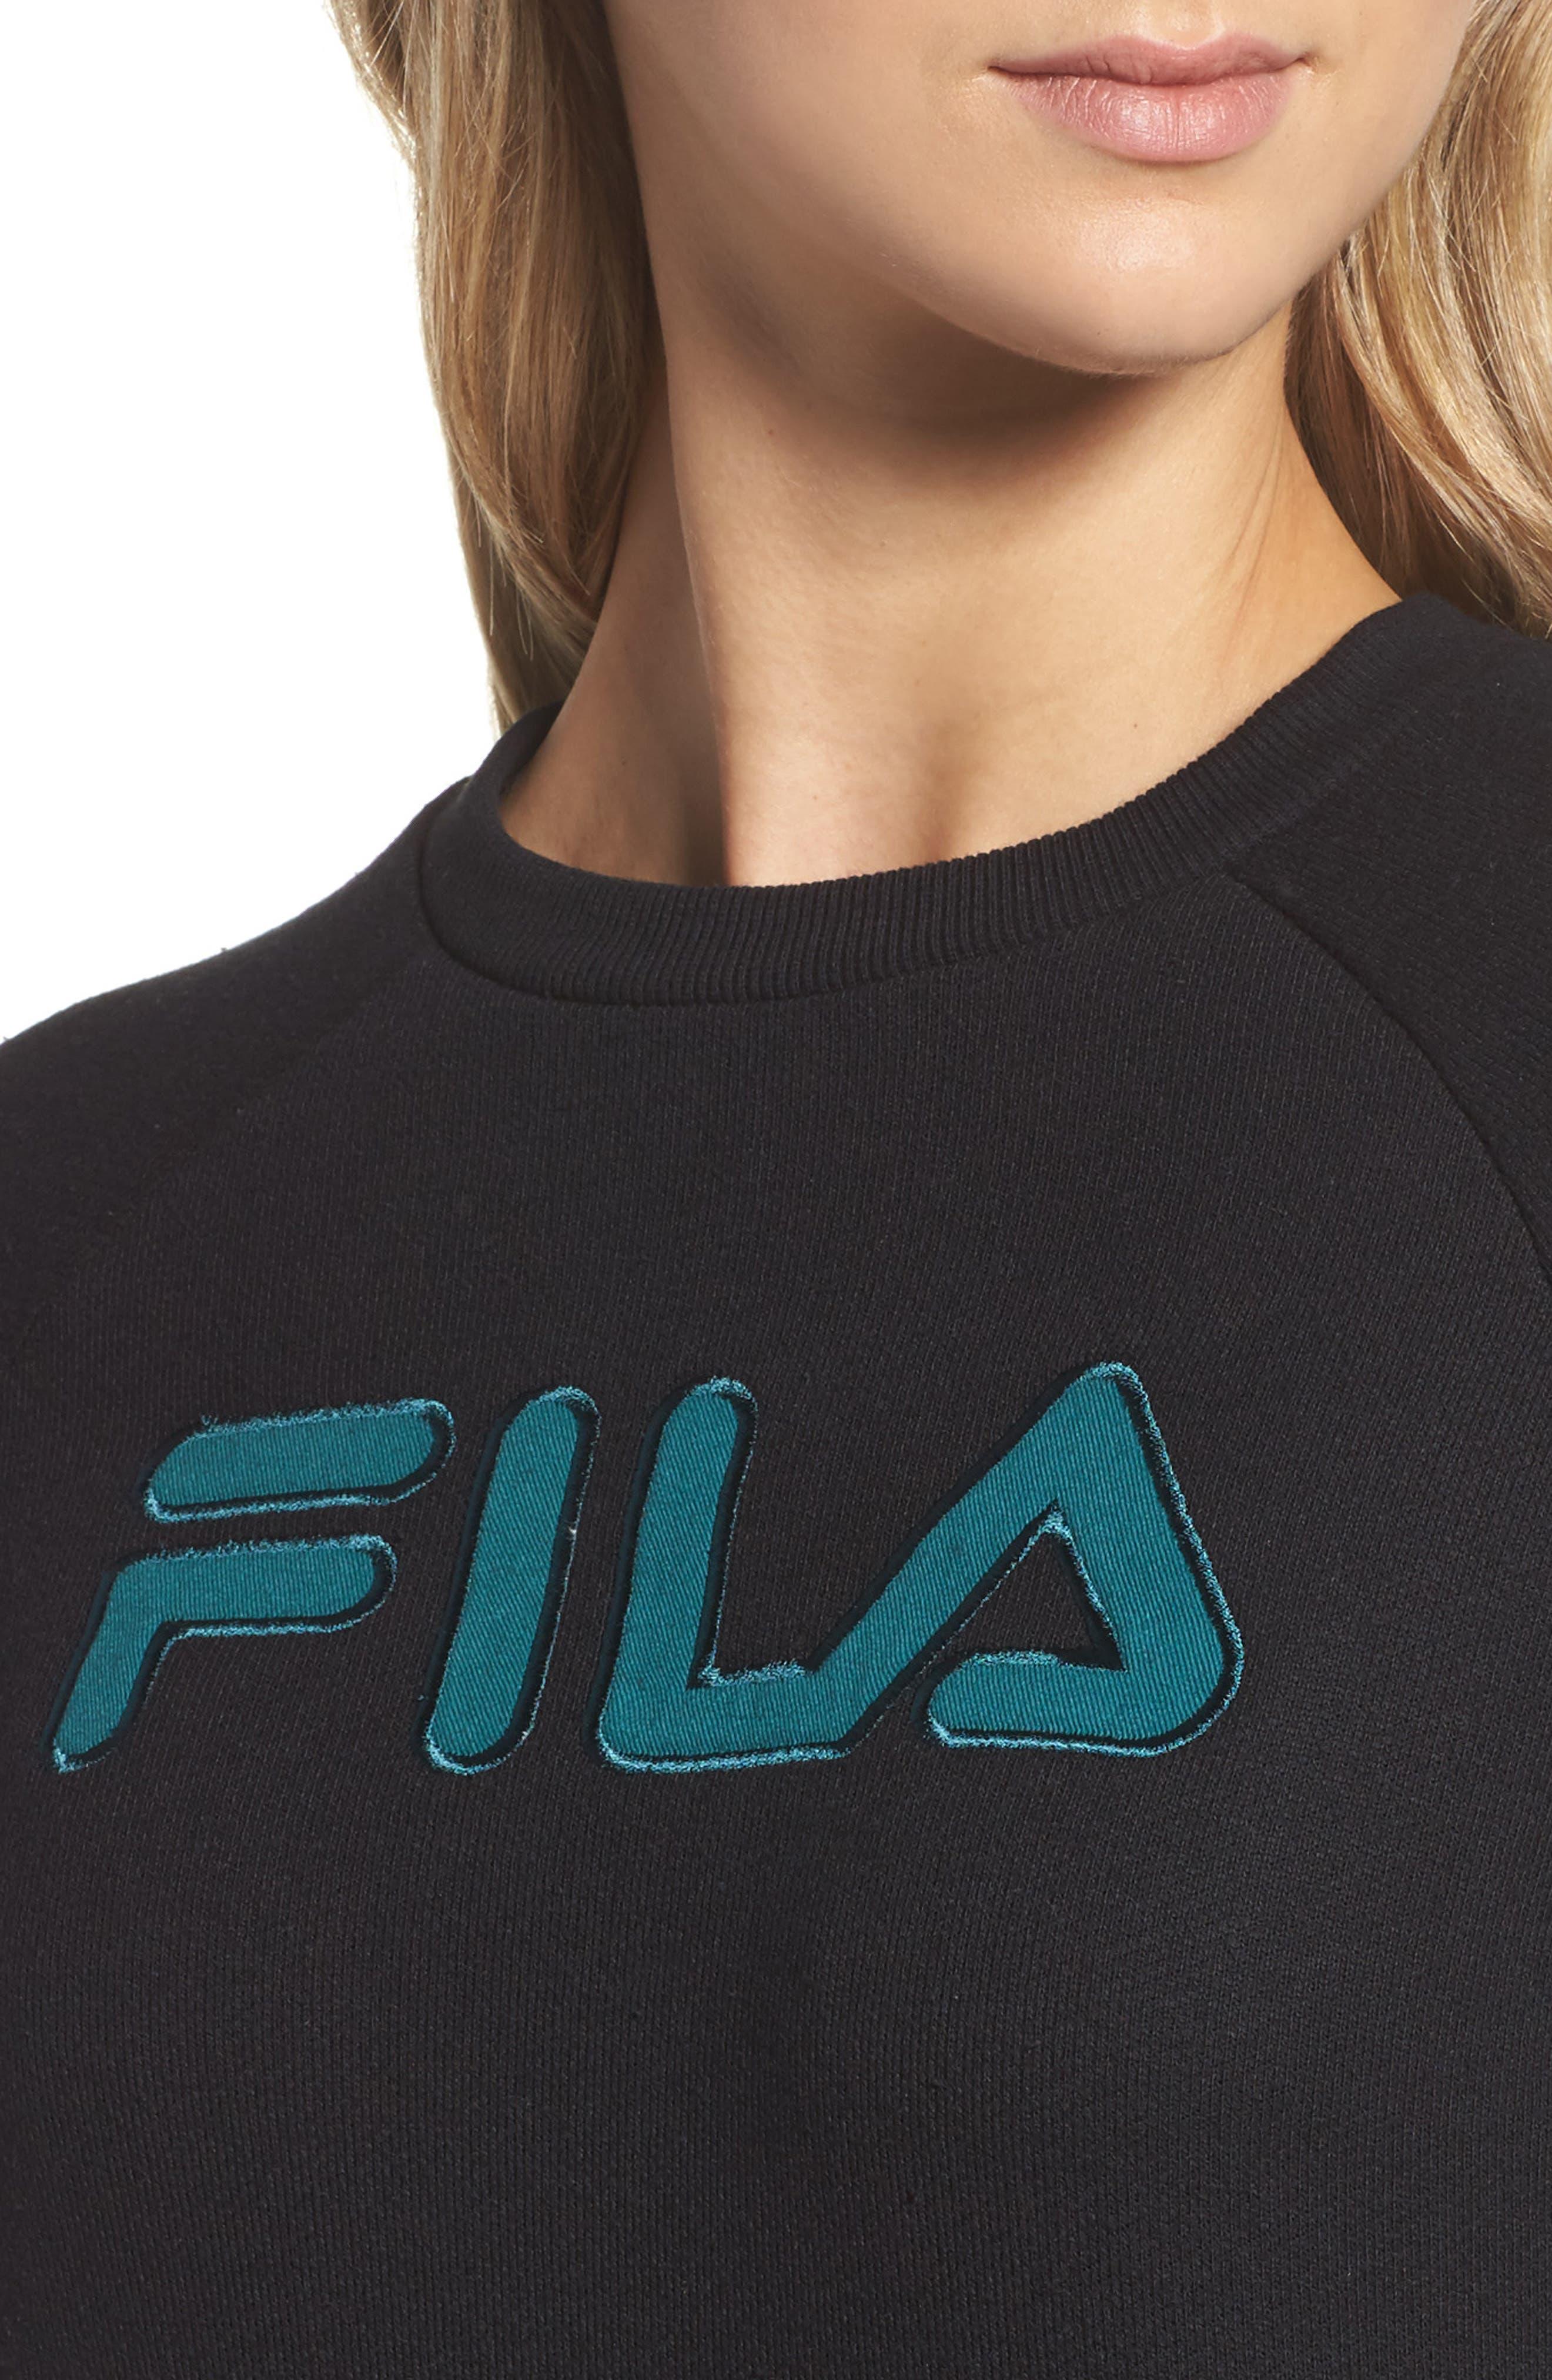 FILA,                             Courtney Sweatshirt Dress,                             Alternate thumbnail 4, color,                             001